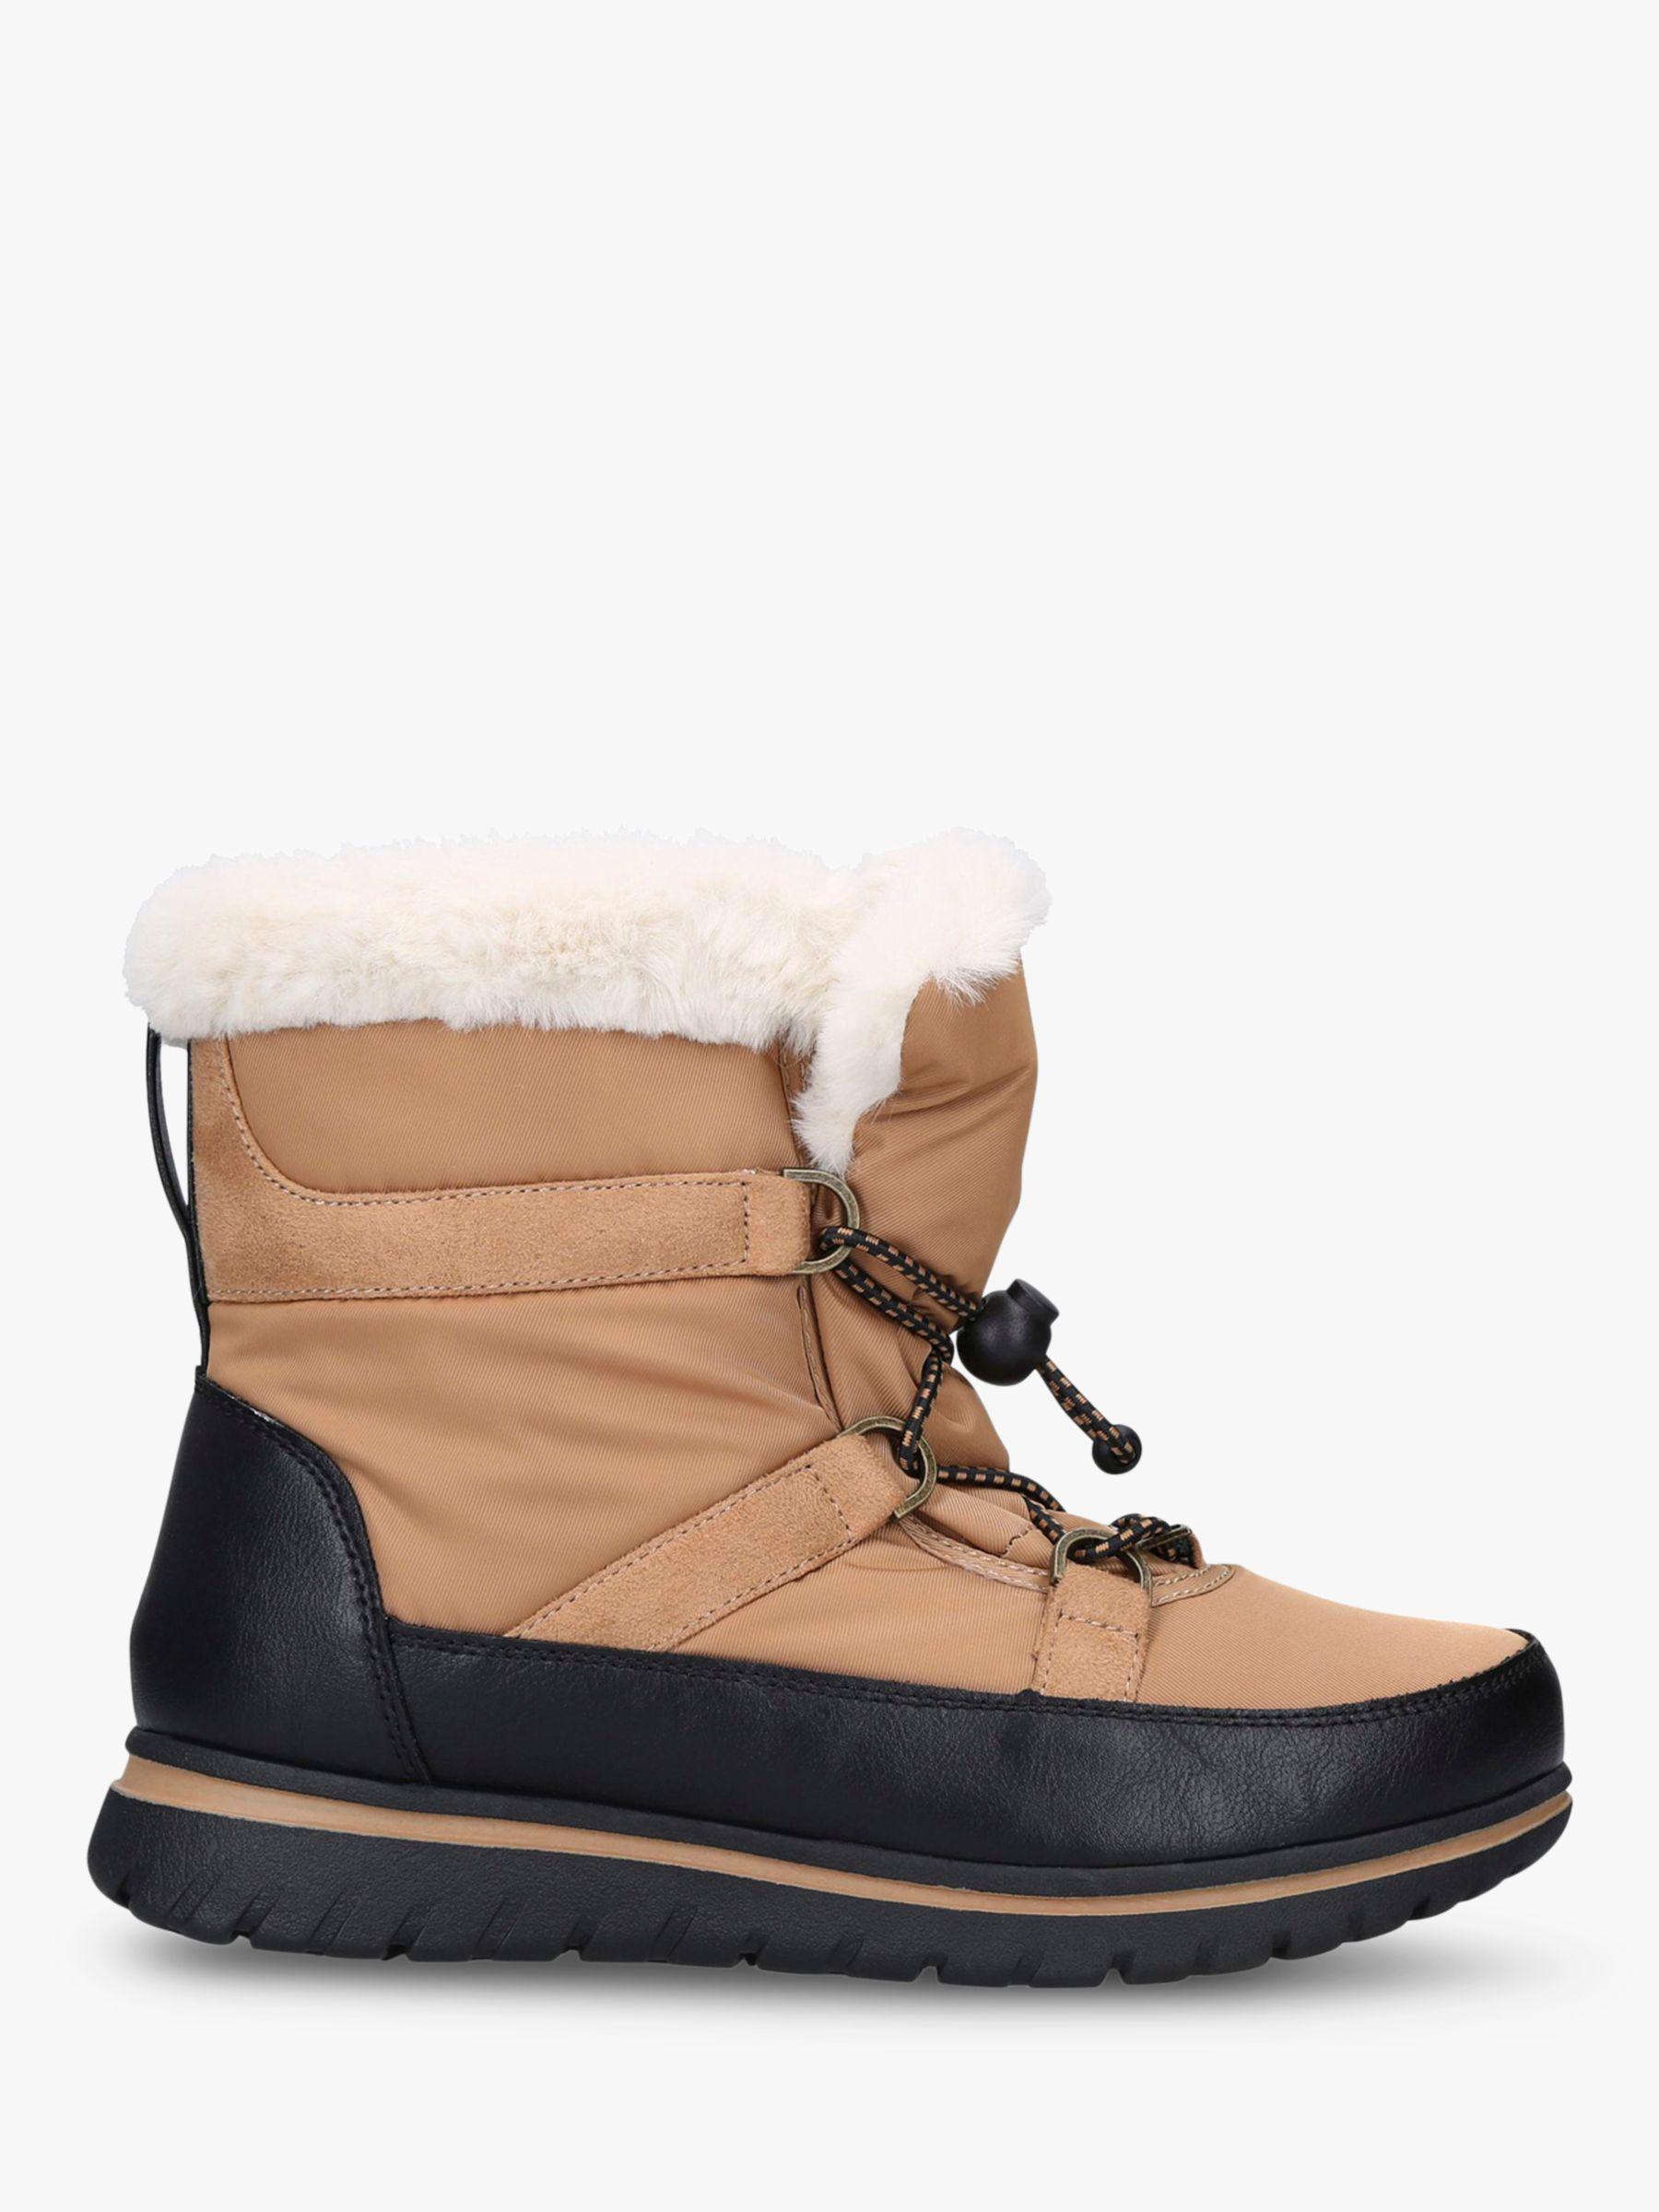 Carvela Comfort Carvela Comfort Ruby Drawstring Snow Boots, Brown Tan